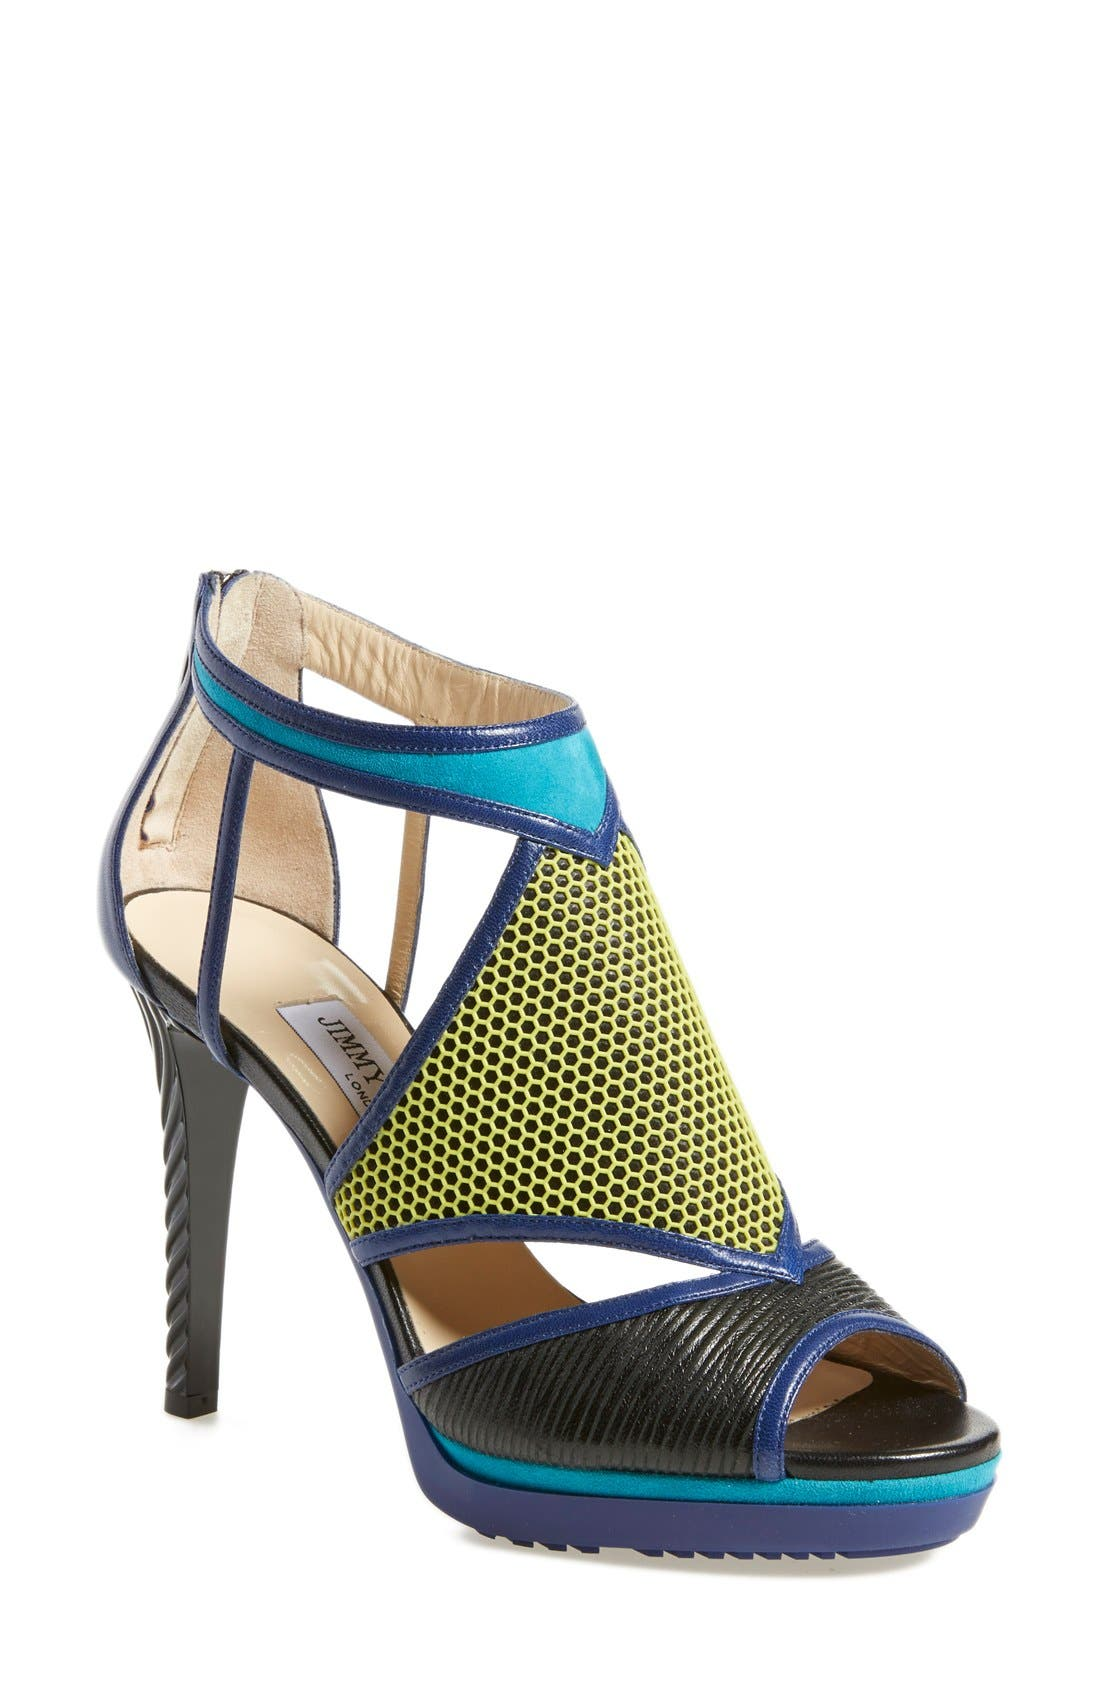 Main Image - Jimmy Choo 'Lythe' Honeycomb Sandal (Women)